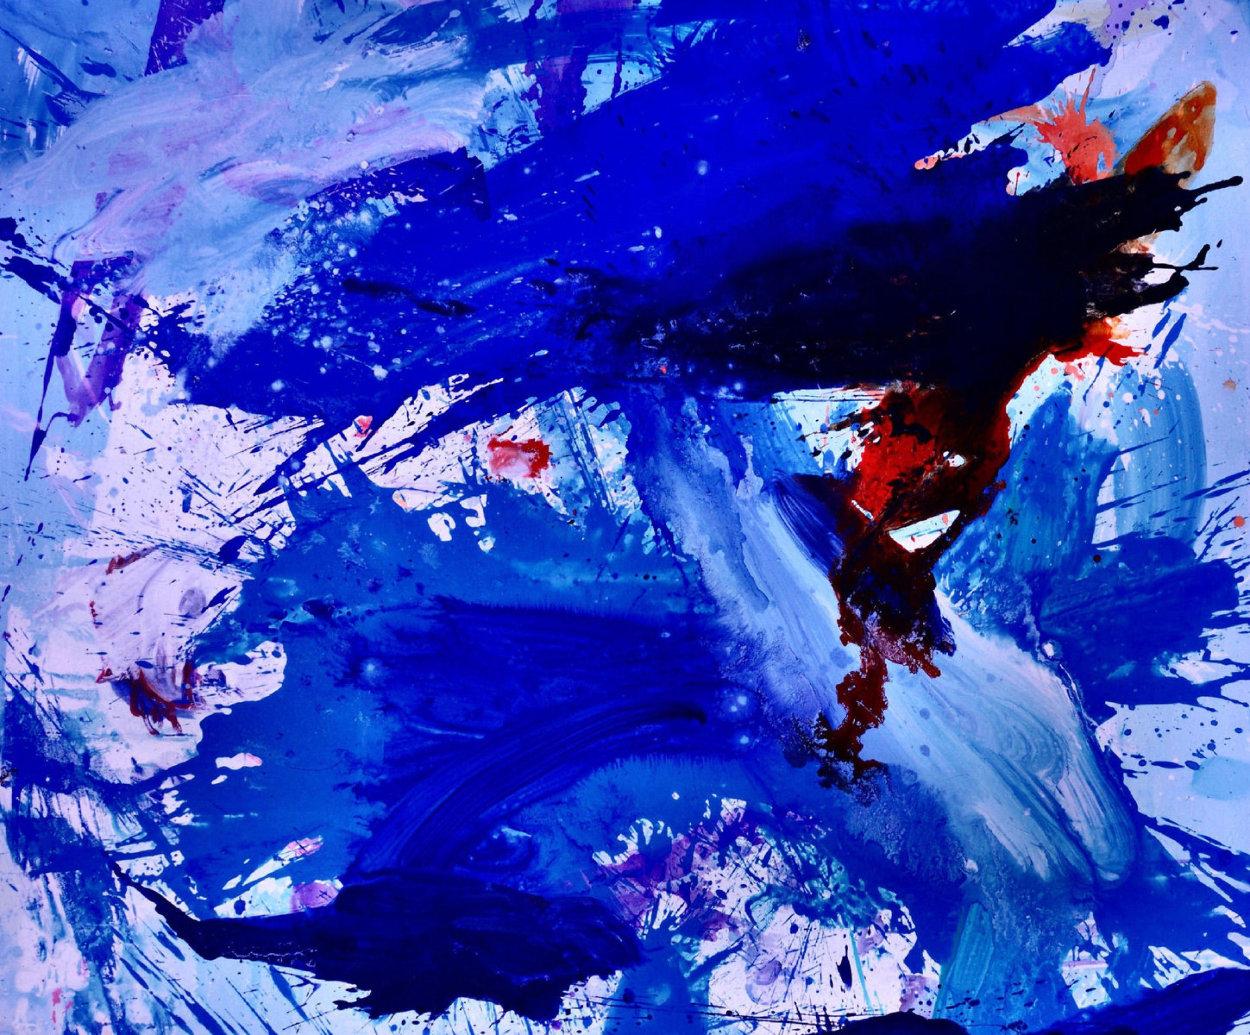 Blue Windows 2016 62x72 Super Huge Original Painting by Costel Iarca